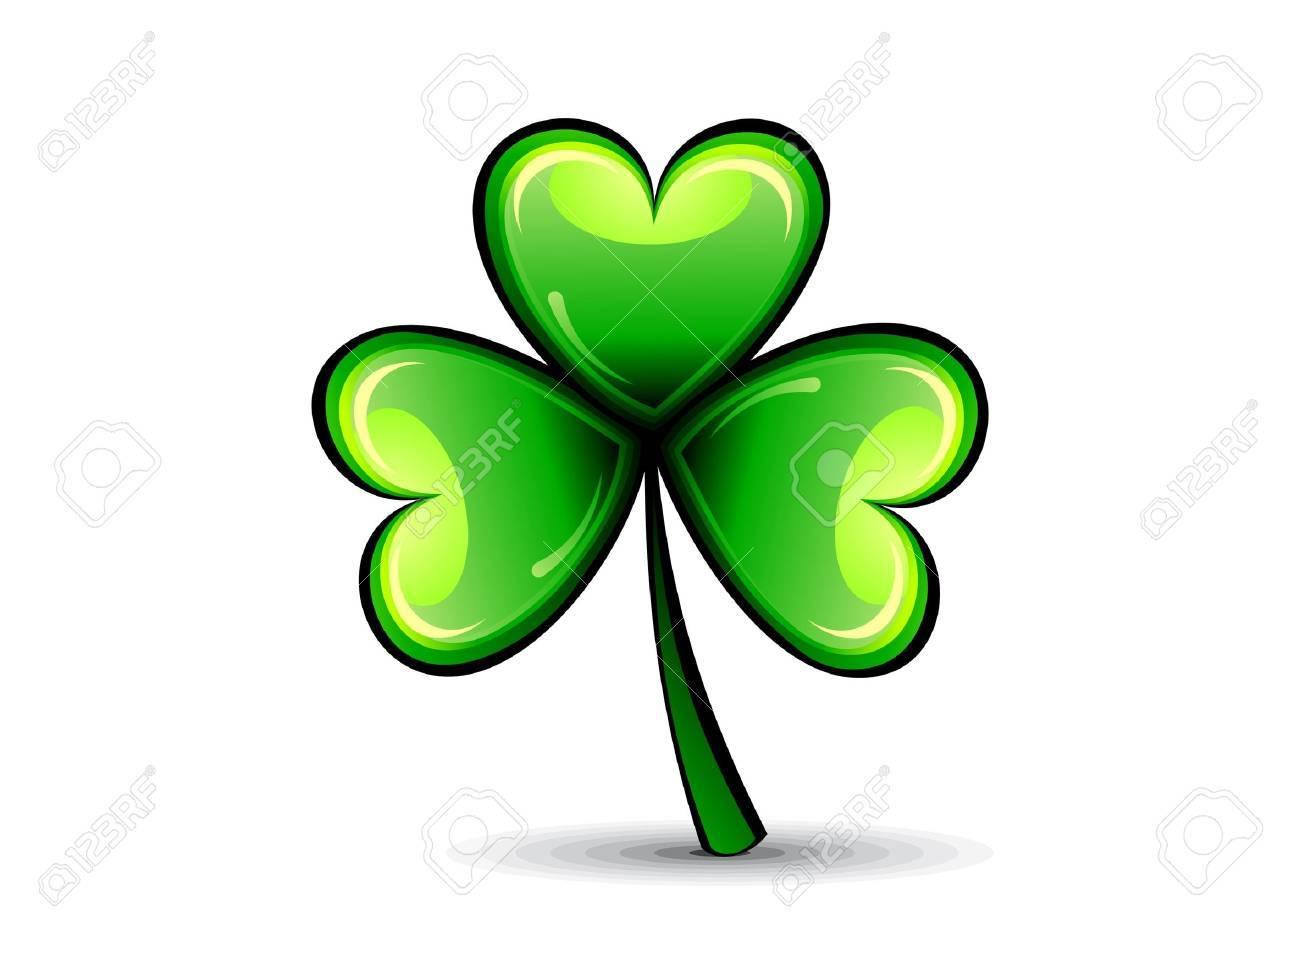 abstract st patrick green shiny clover vector illustration Stock Vector - 12491141